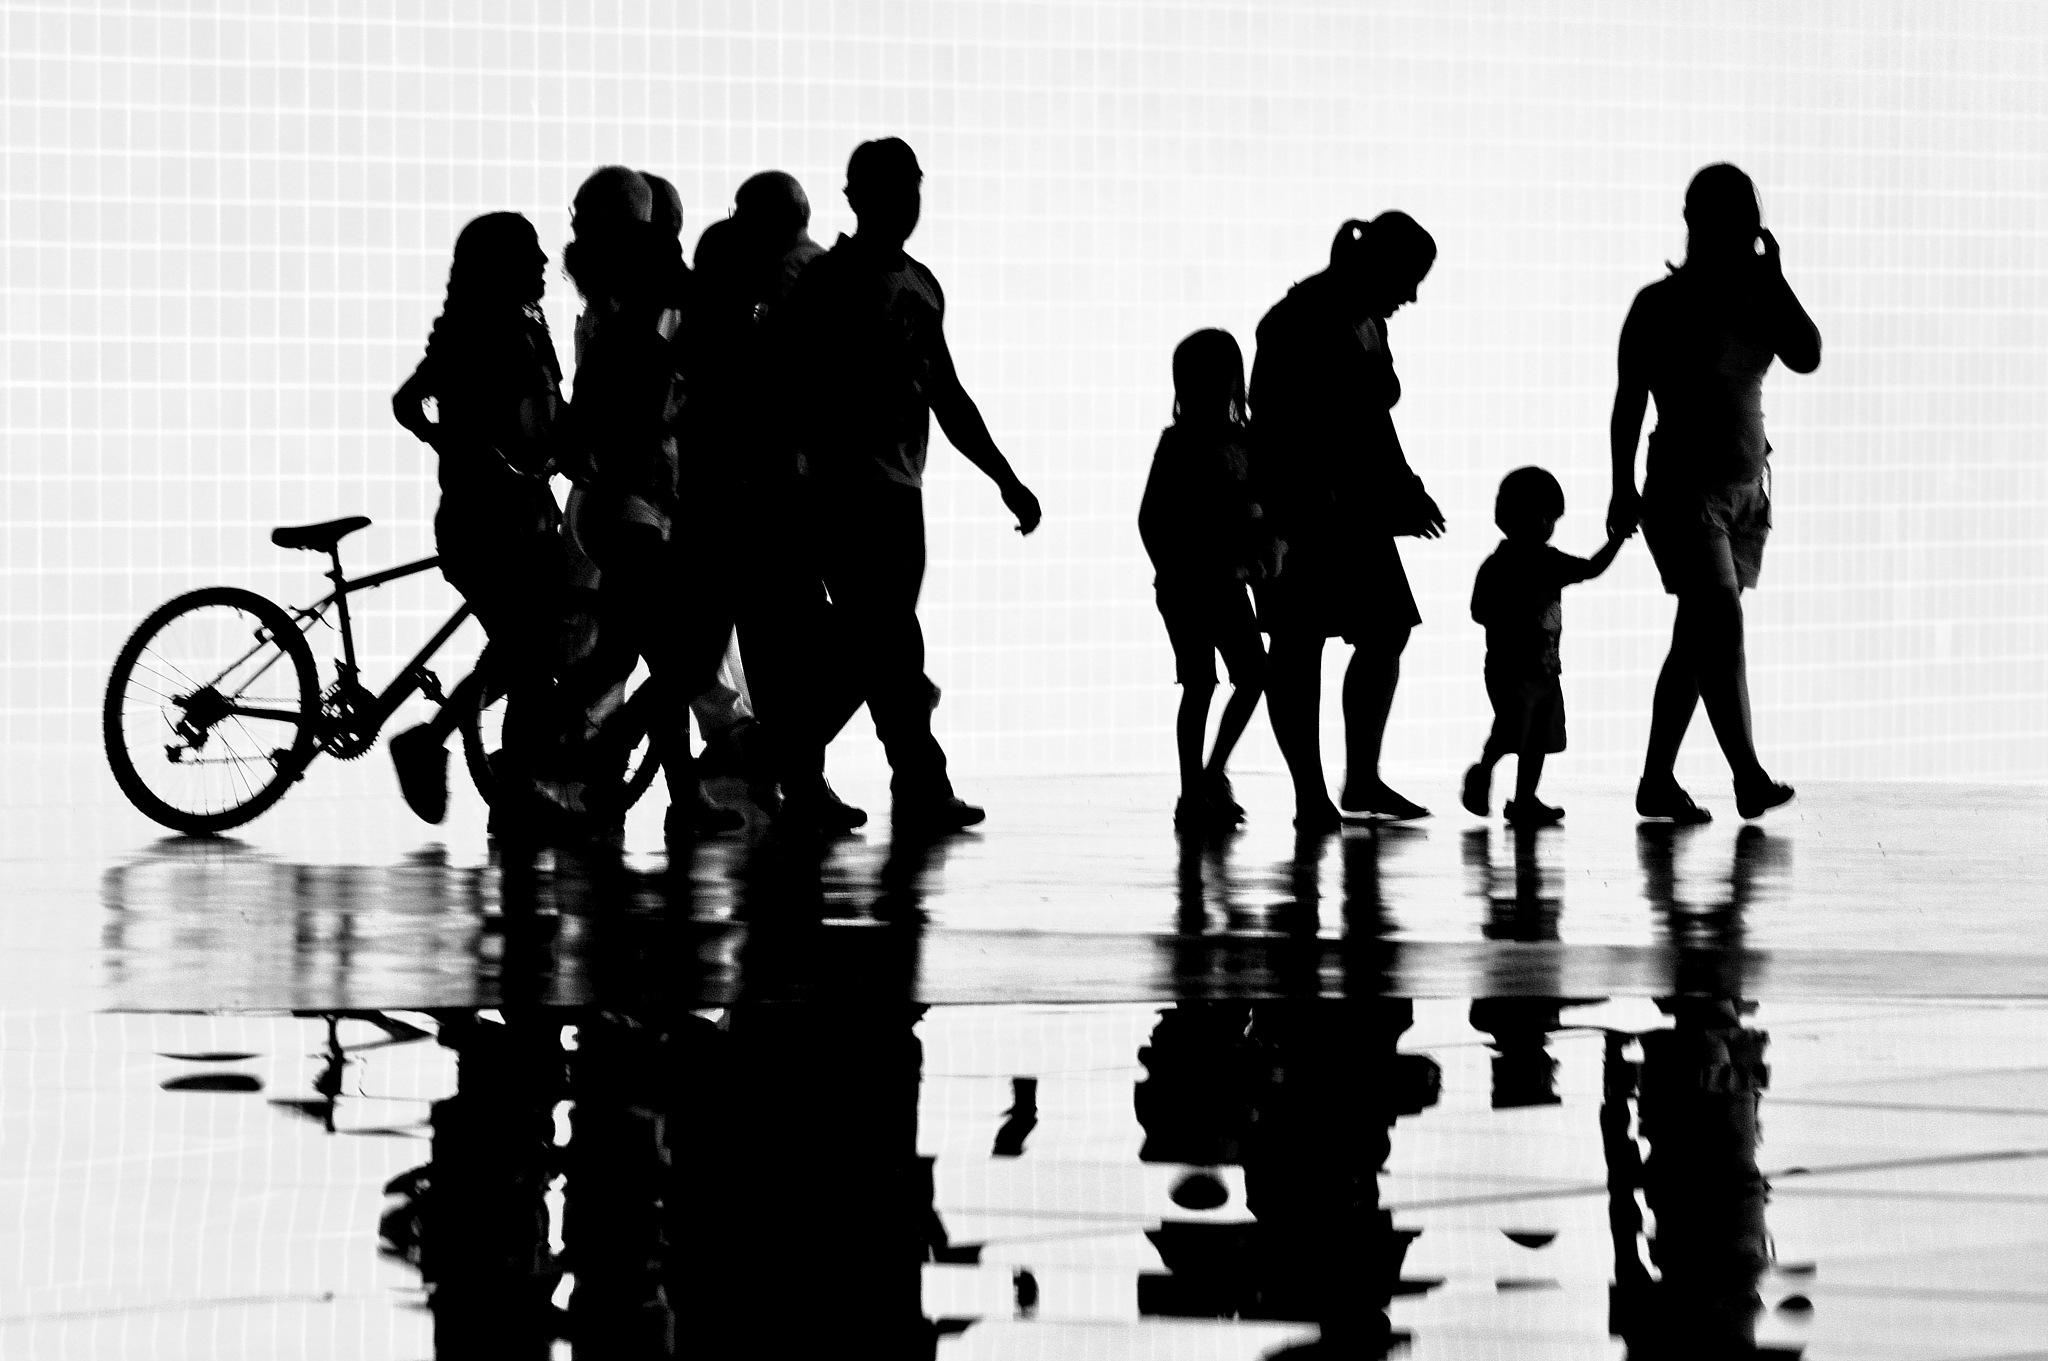 Cwb 's people by José Evaldo Suassuna de Oliveira